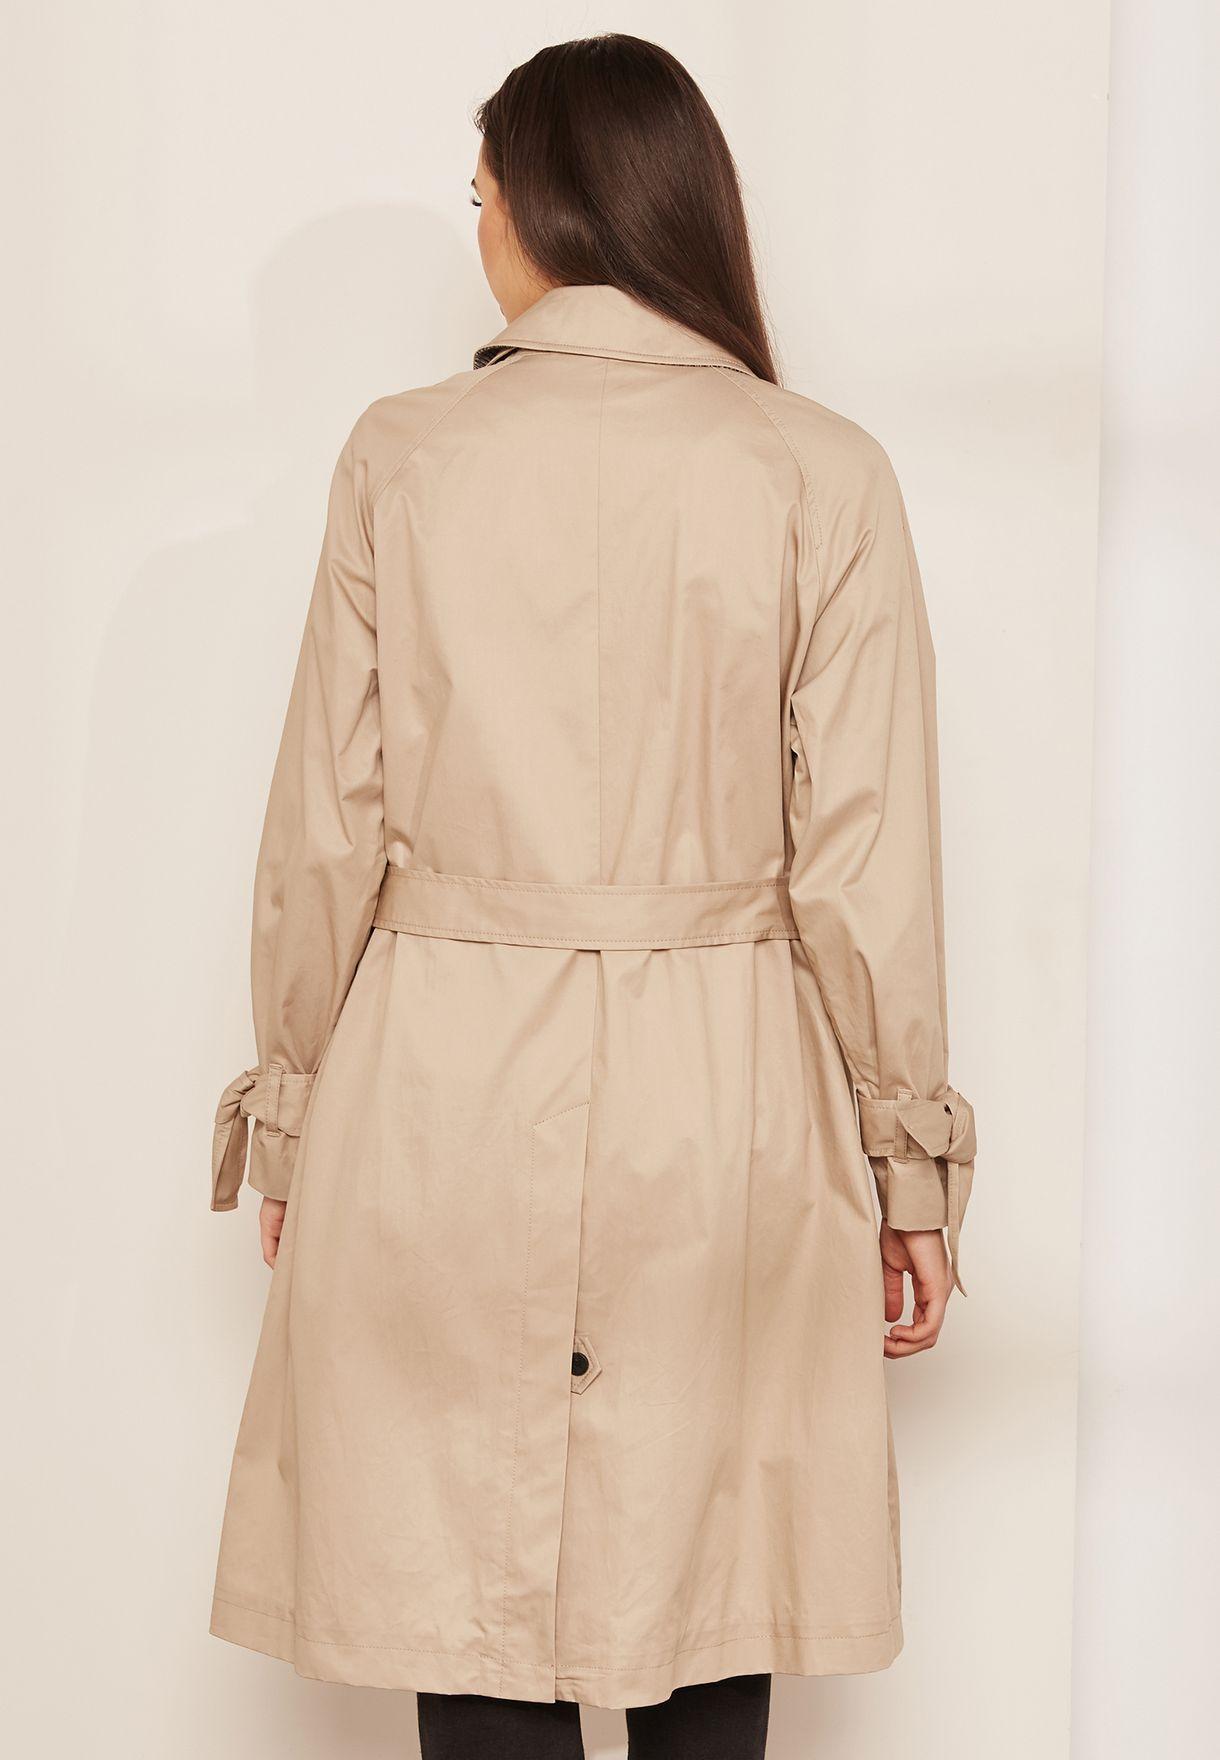 ca0a95a75e4 Shop Tommy Hilfiger beige Bogart Trench Coat WW0WW23115 for Women in ...